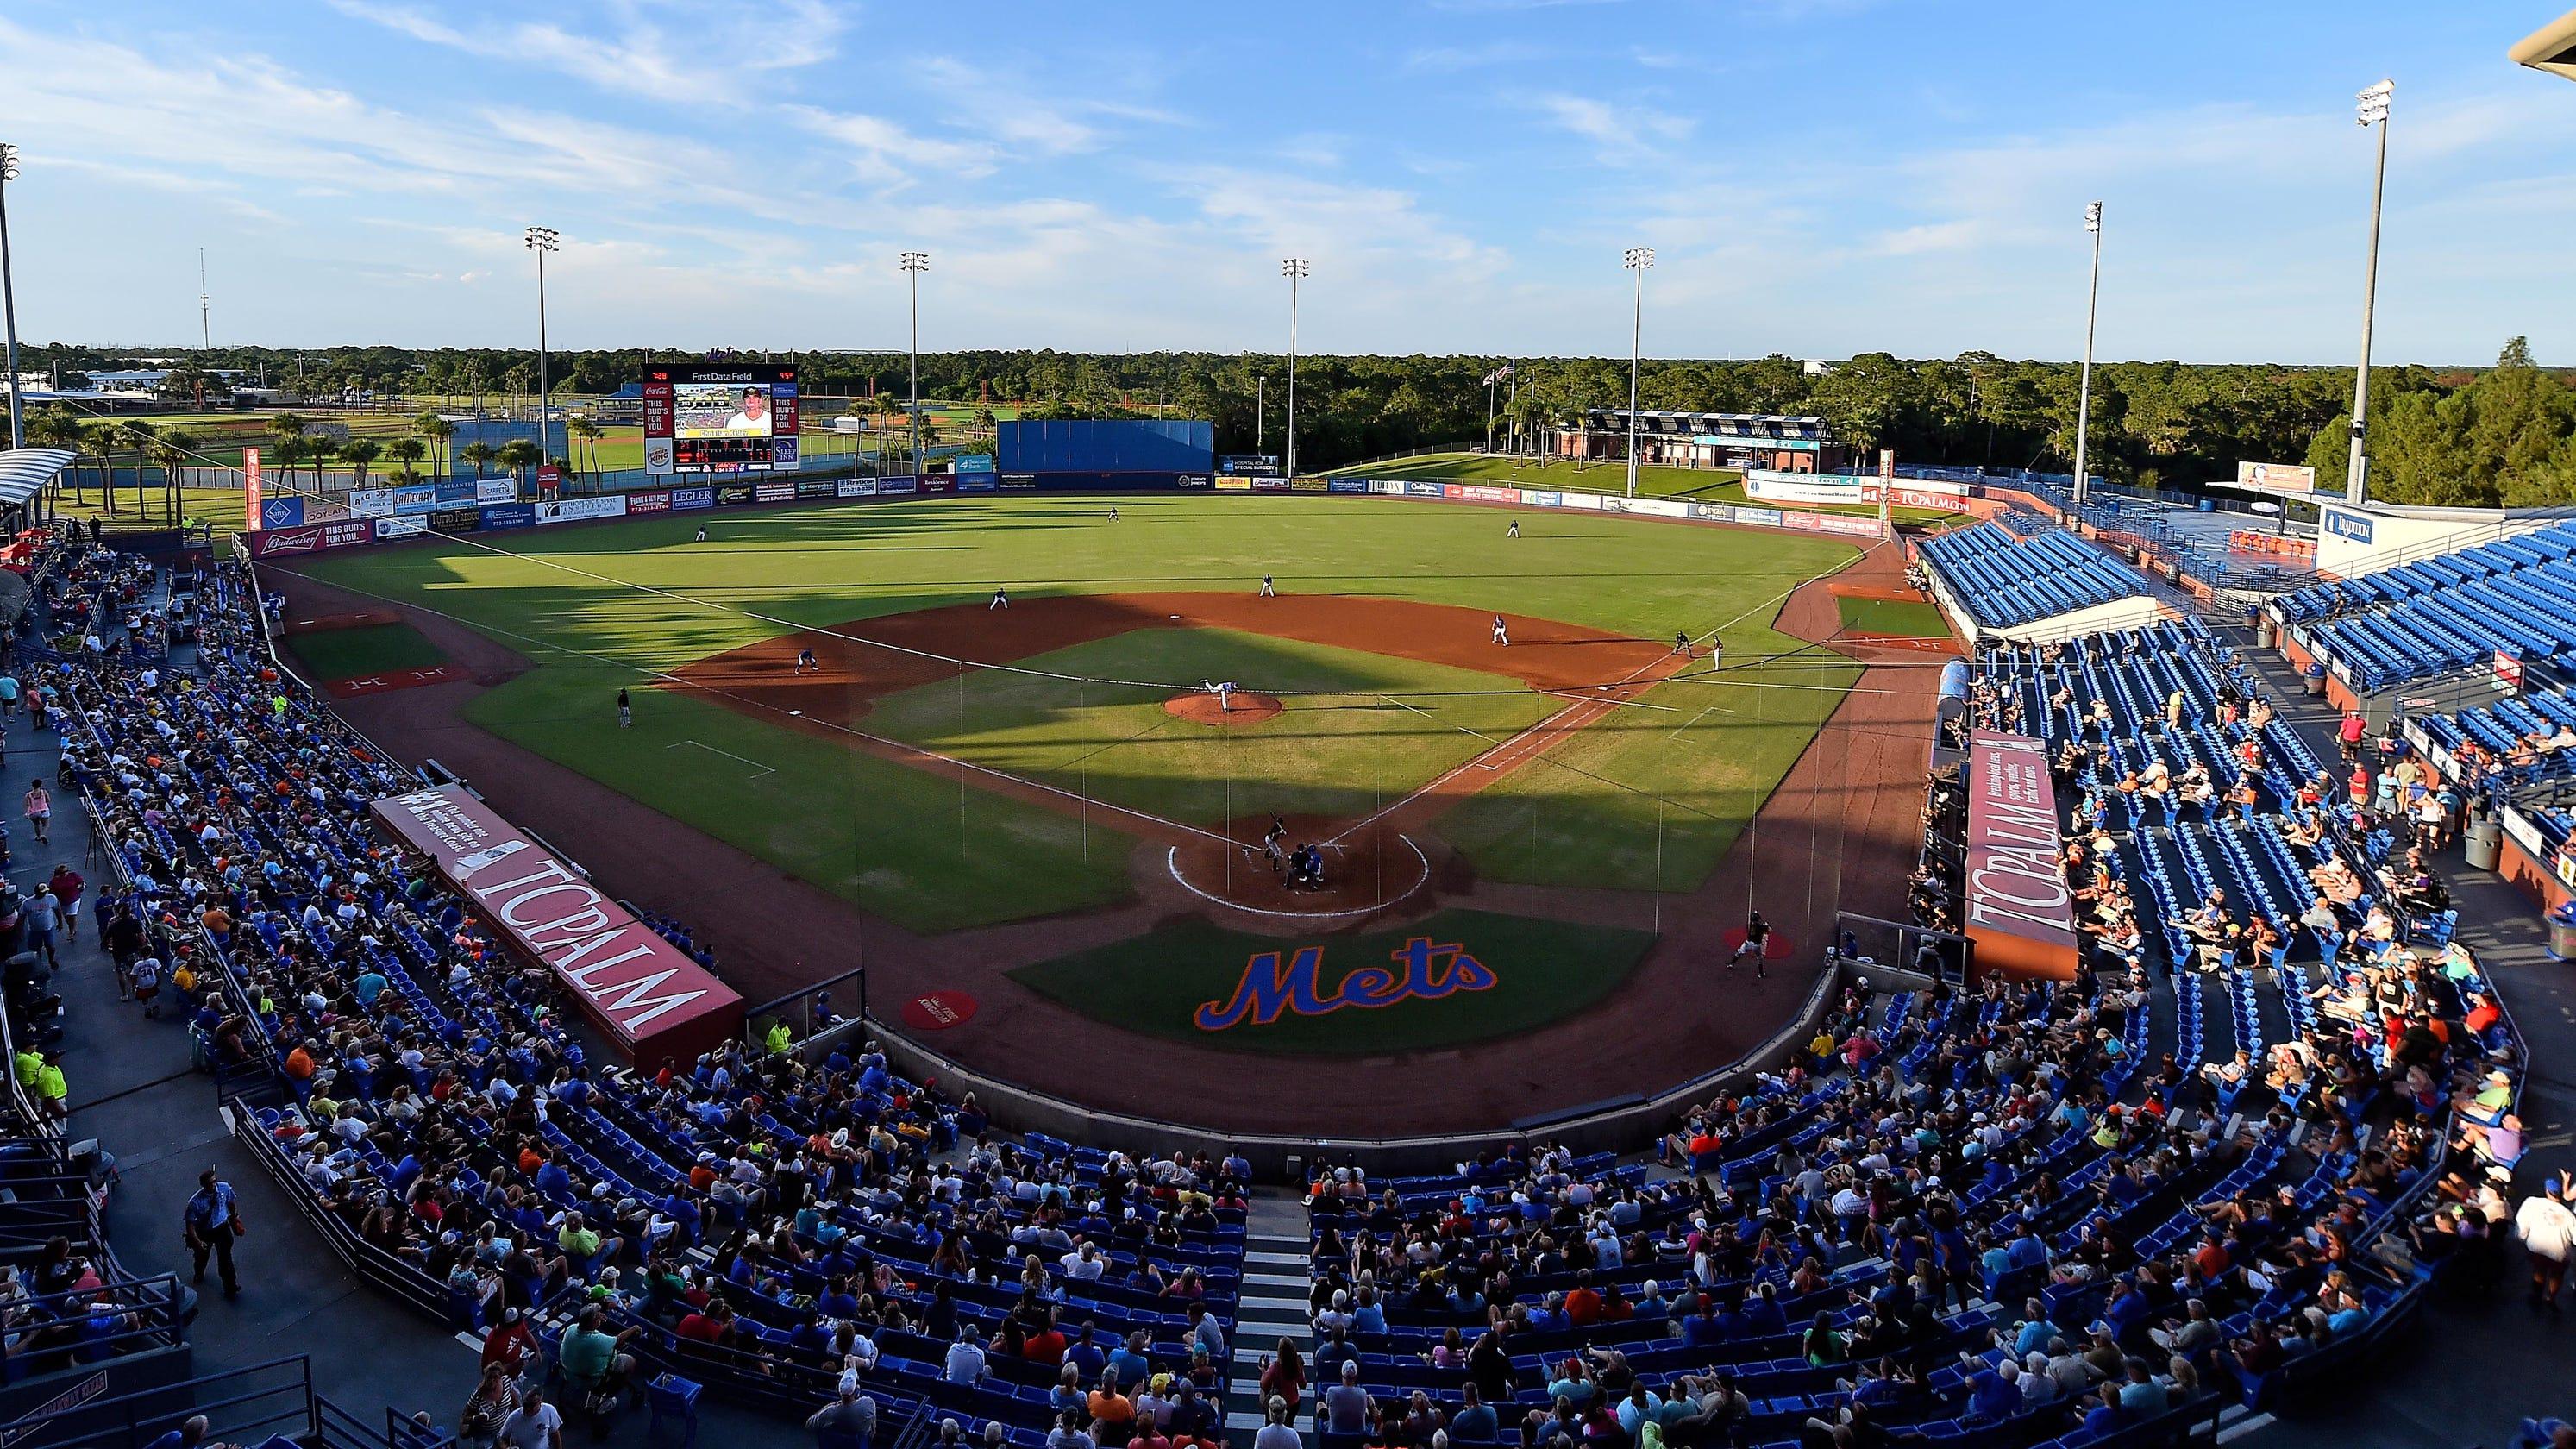 MLB minor league affiliates: Full list of baseball's farm system teams for 2020